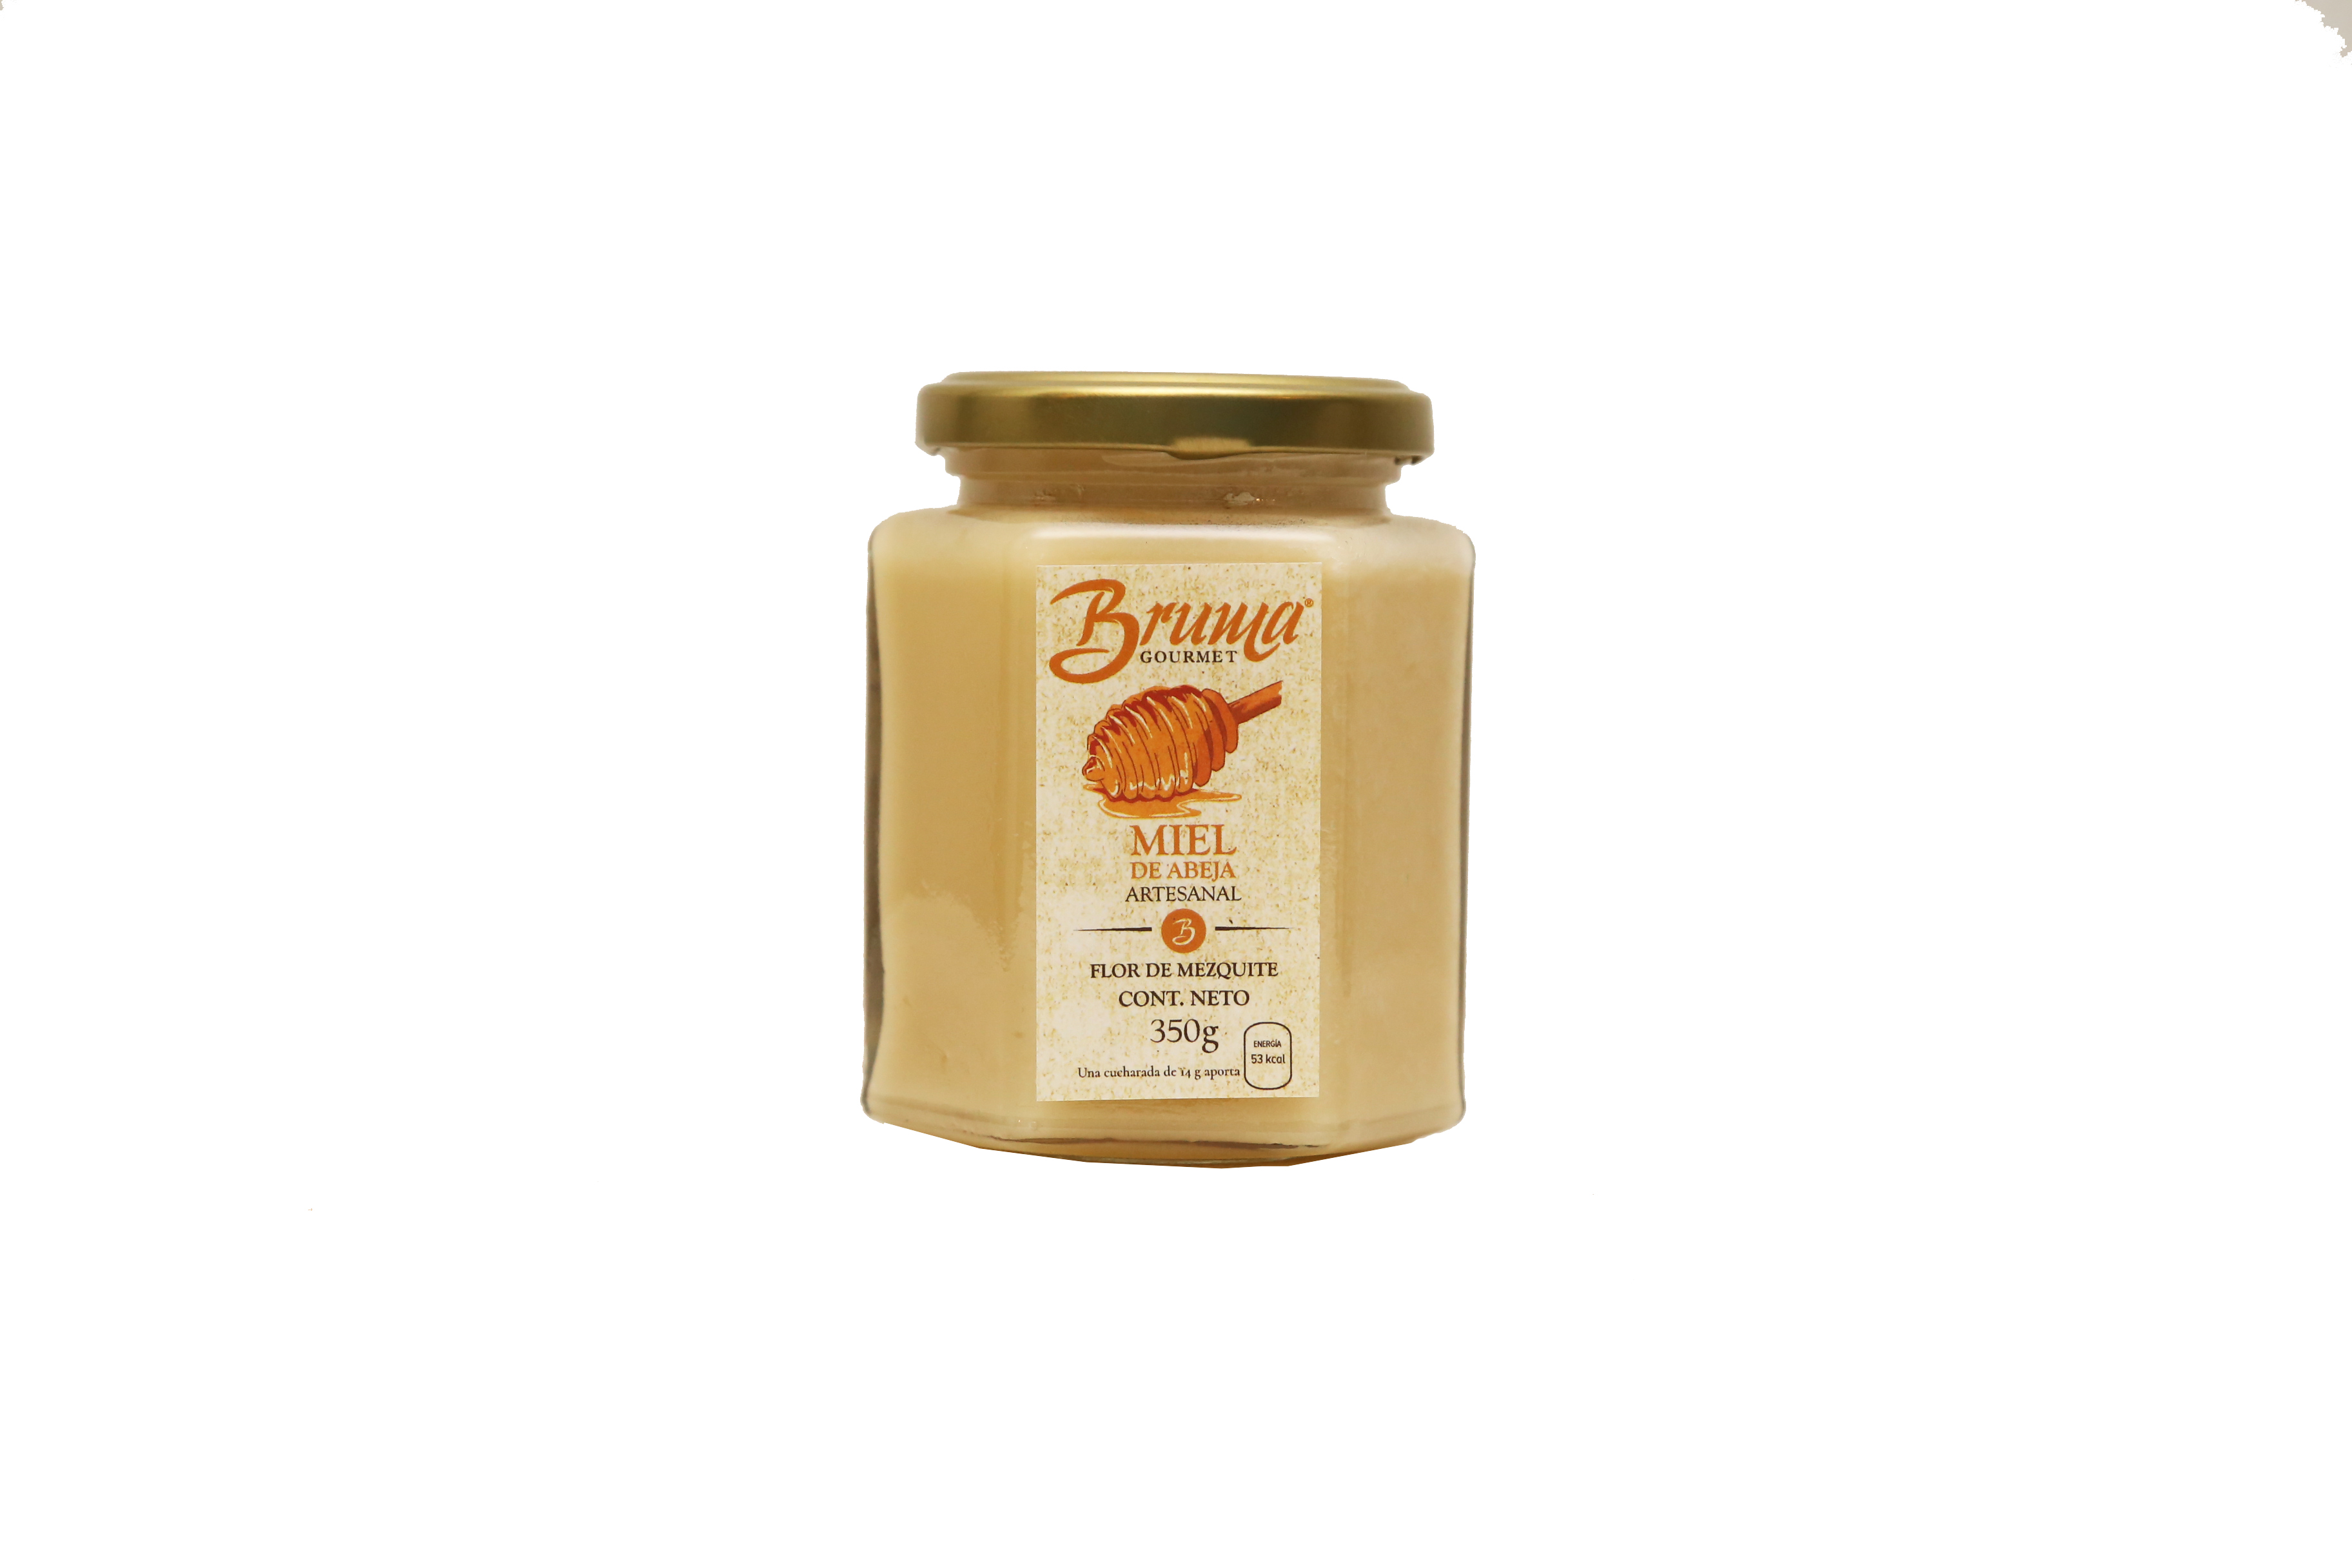 Miel Artesanal Flor de Mesquite de Bruma Gourmet